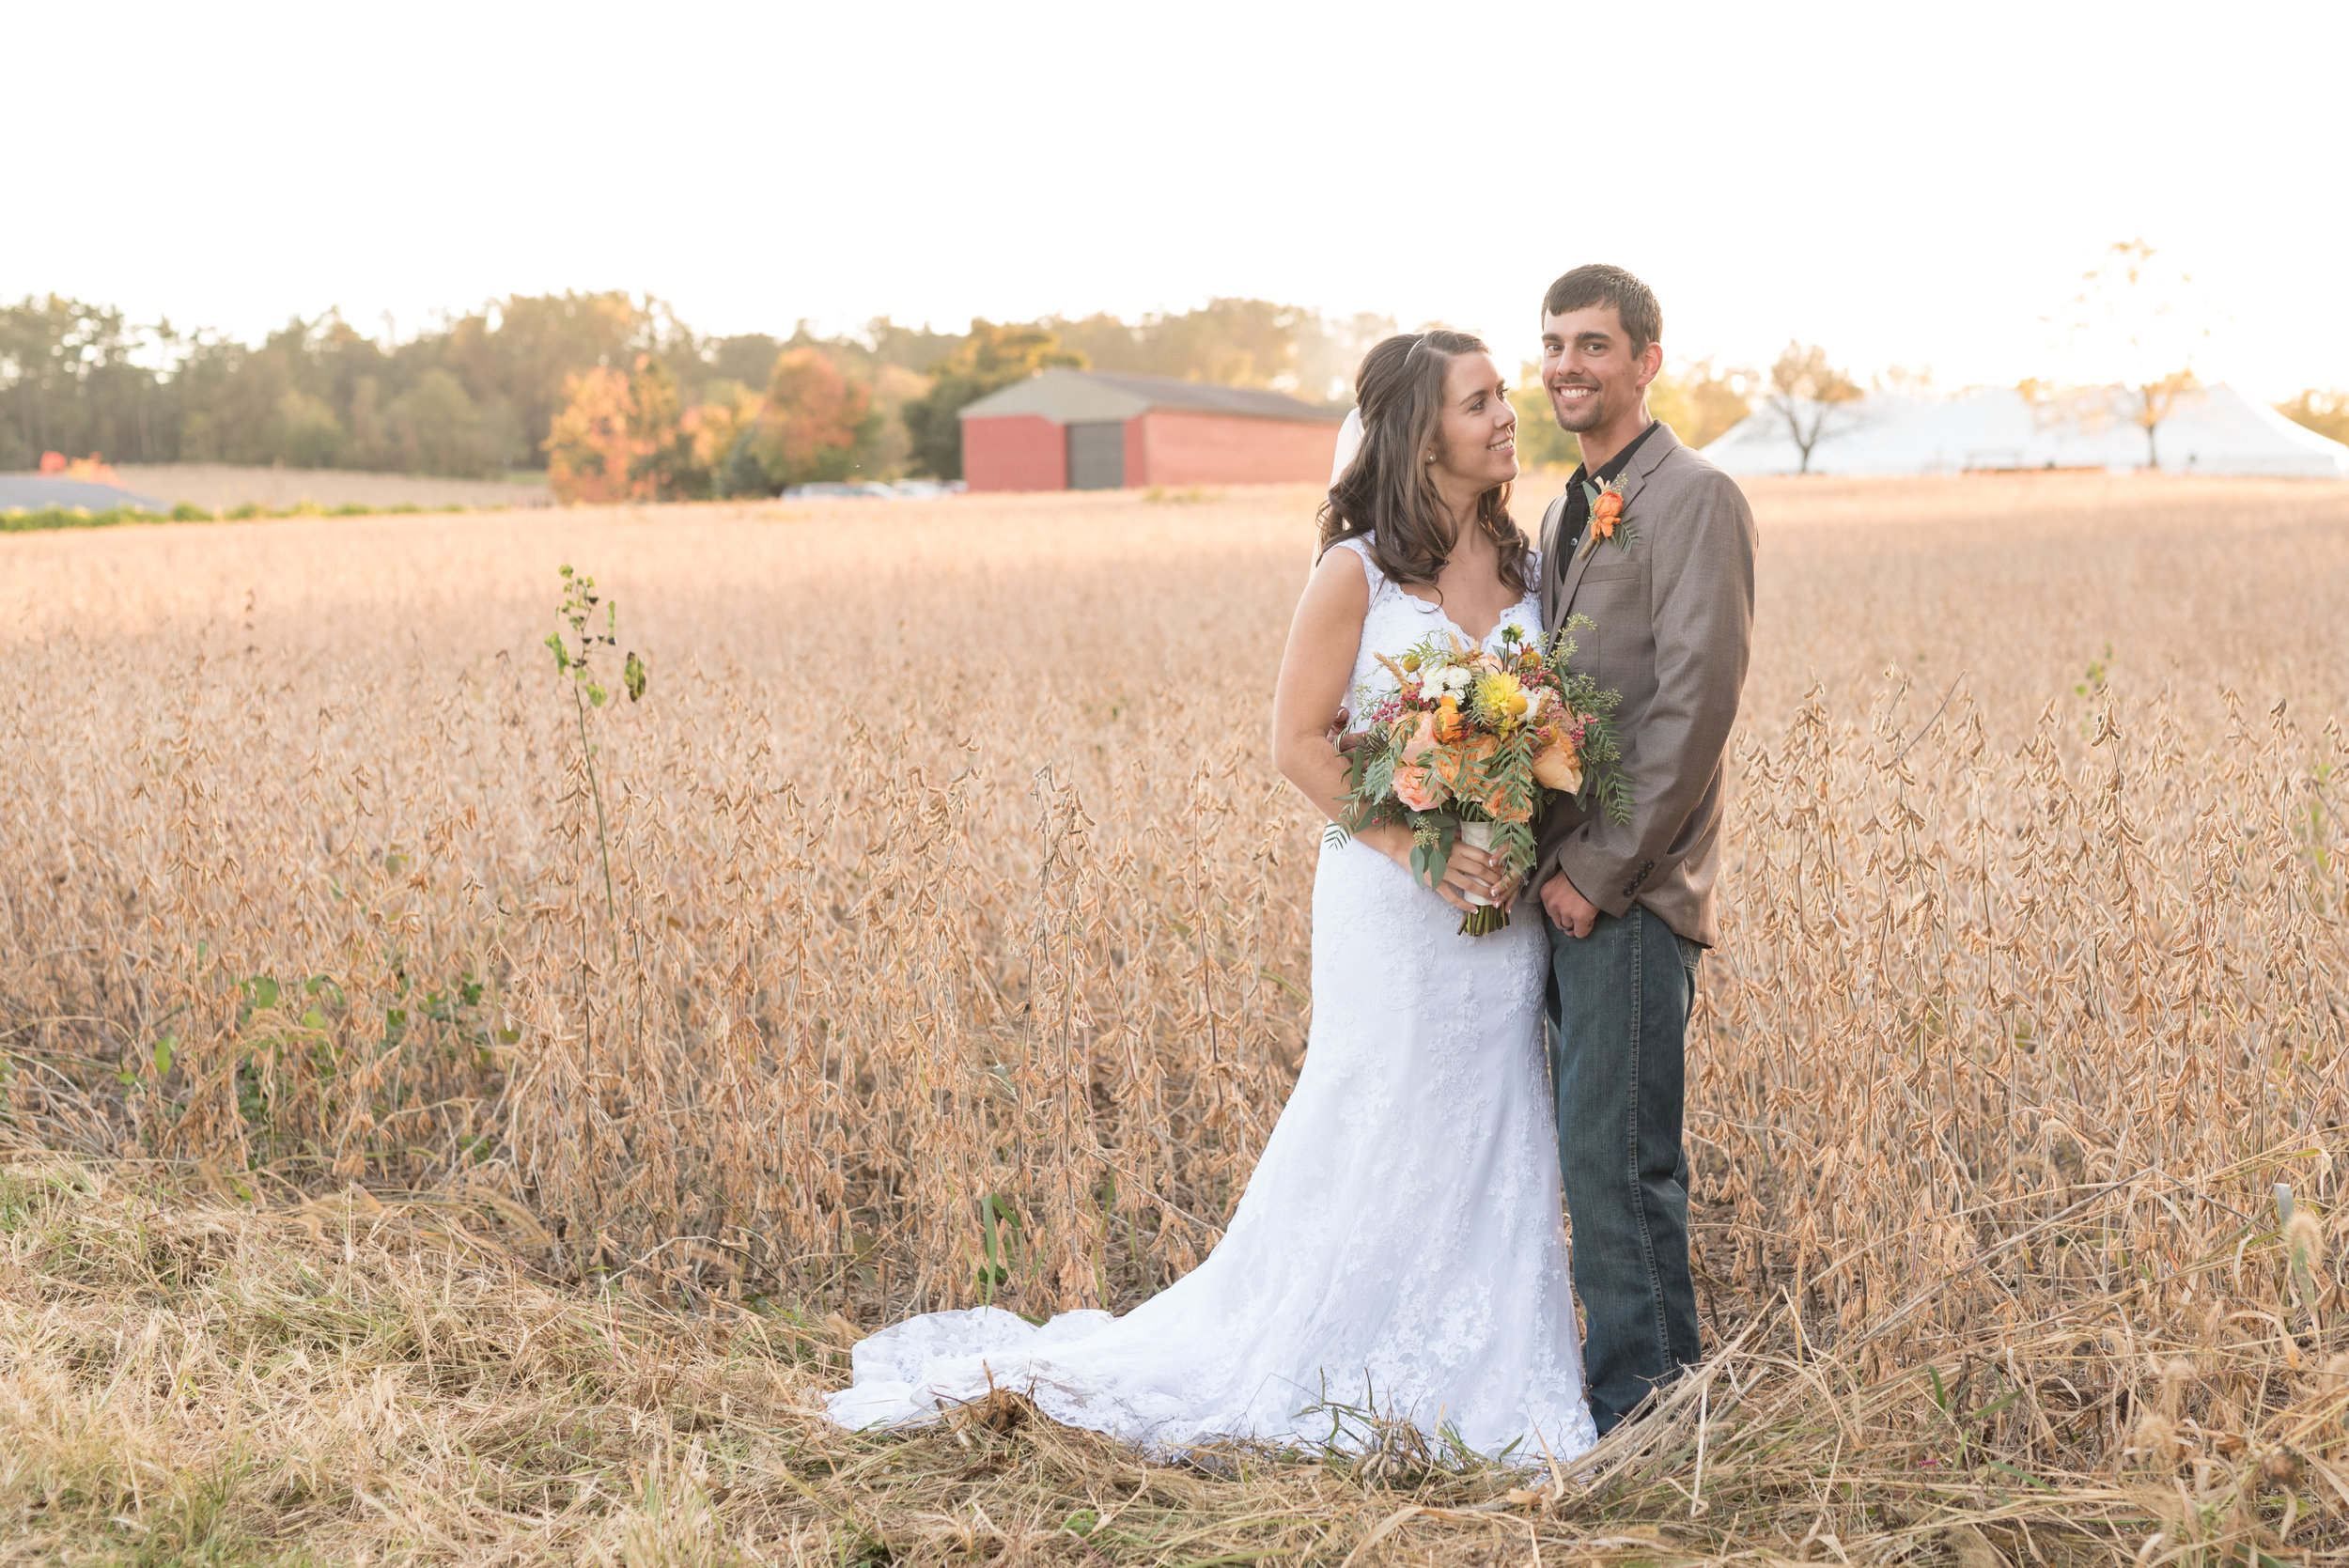 lancaster-county-wedding-details-wedding-photography-photos